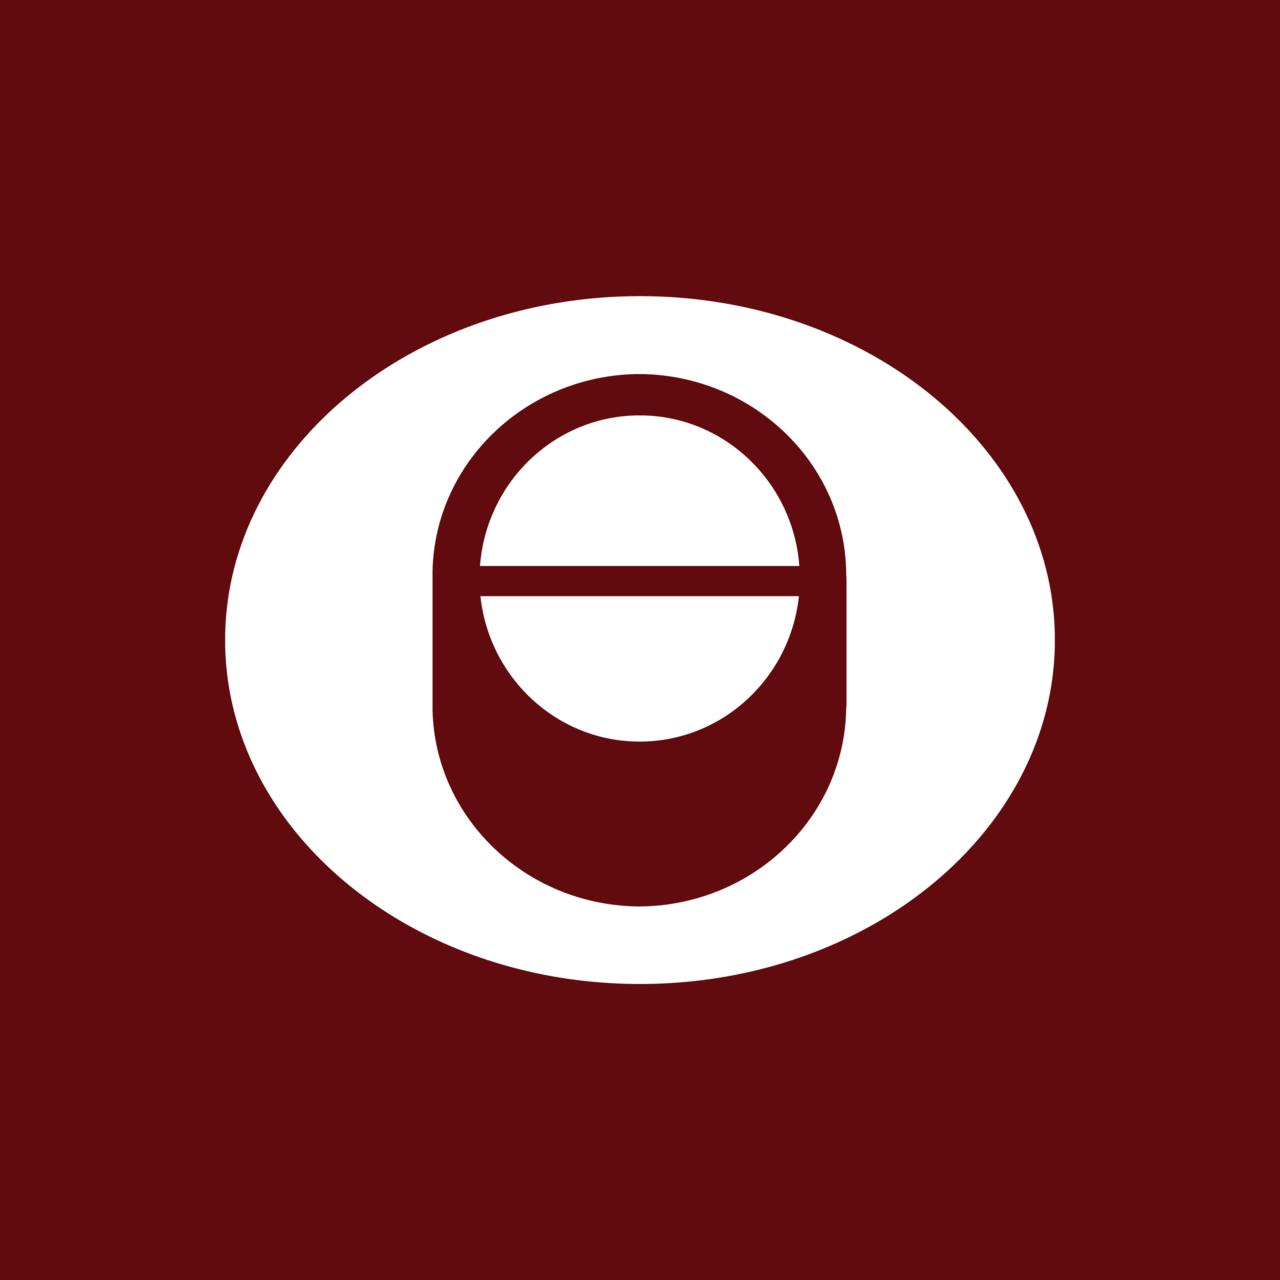 Image result for international coffee organisation logo